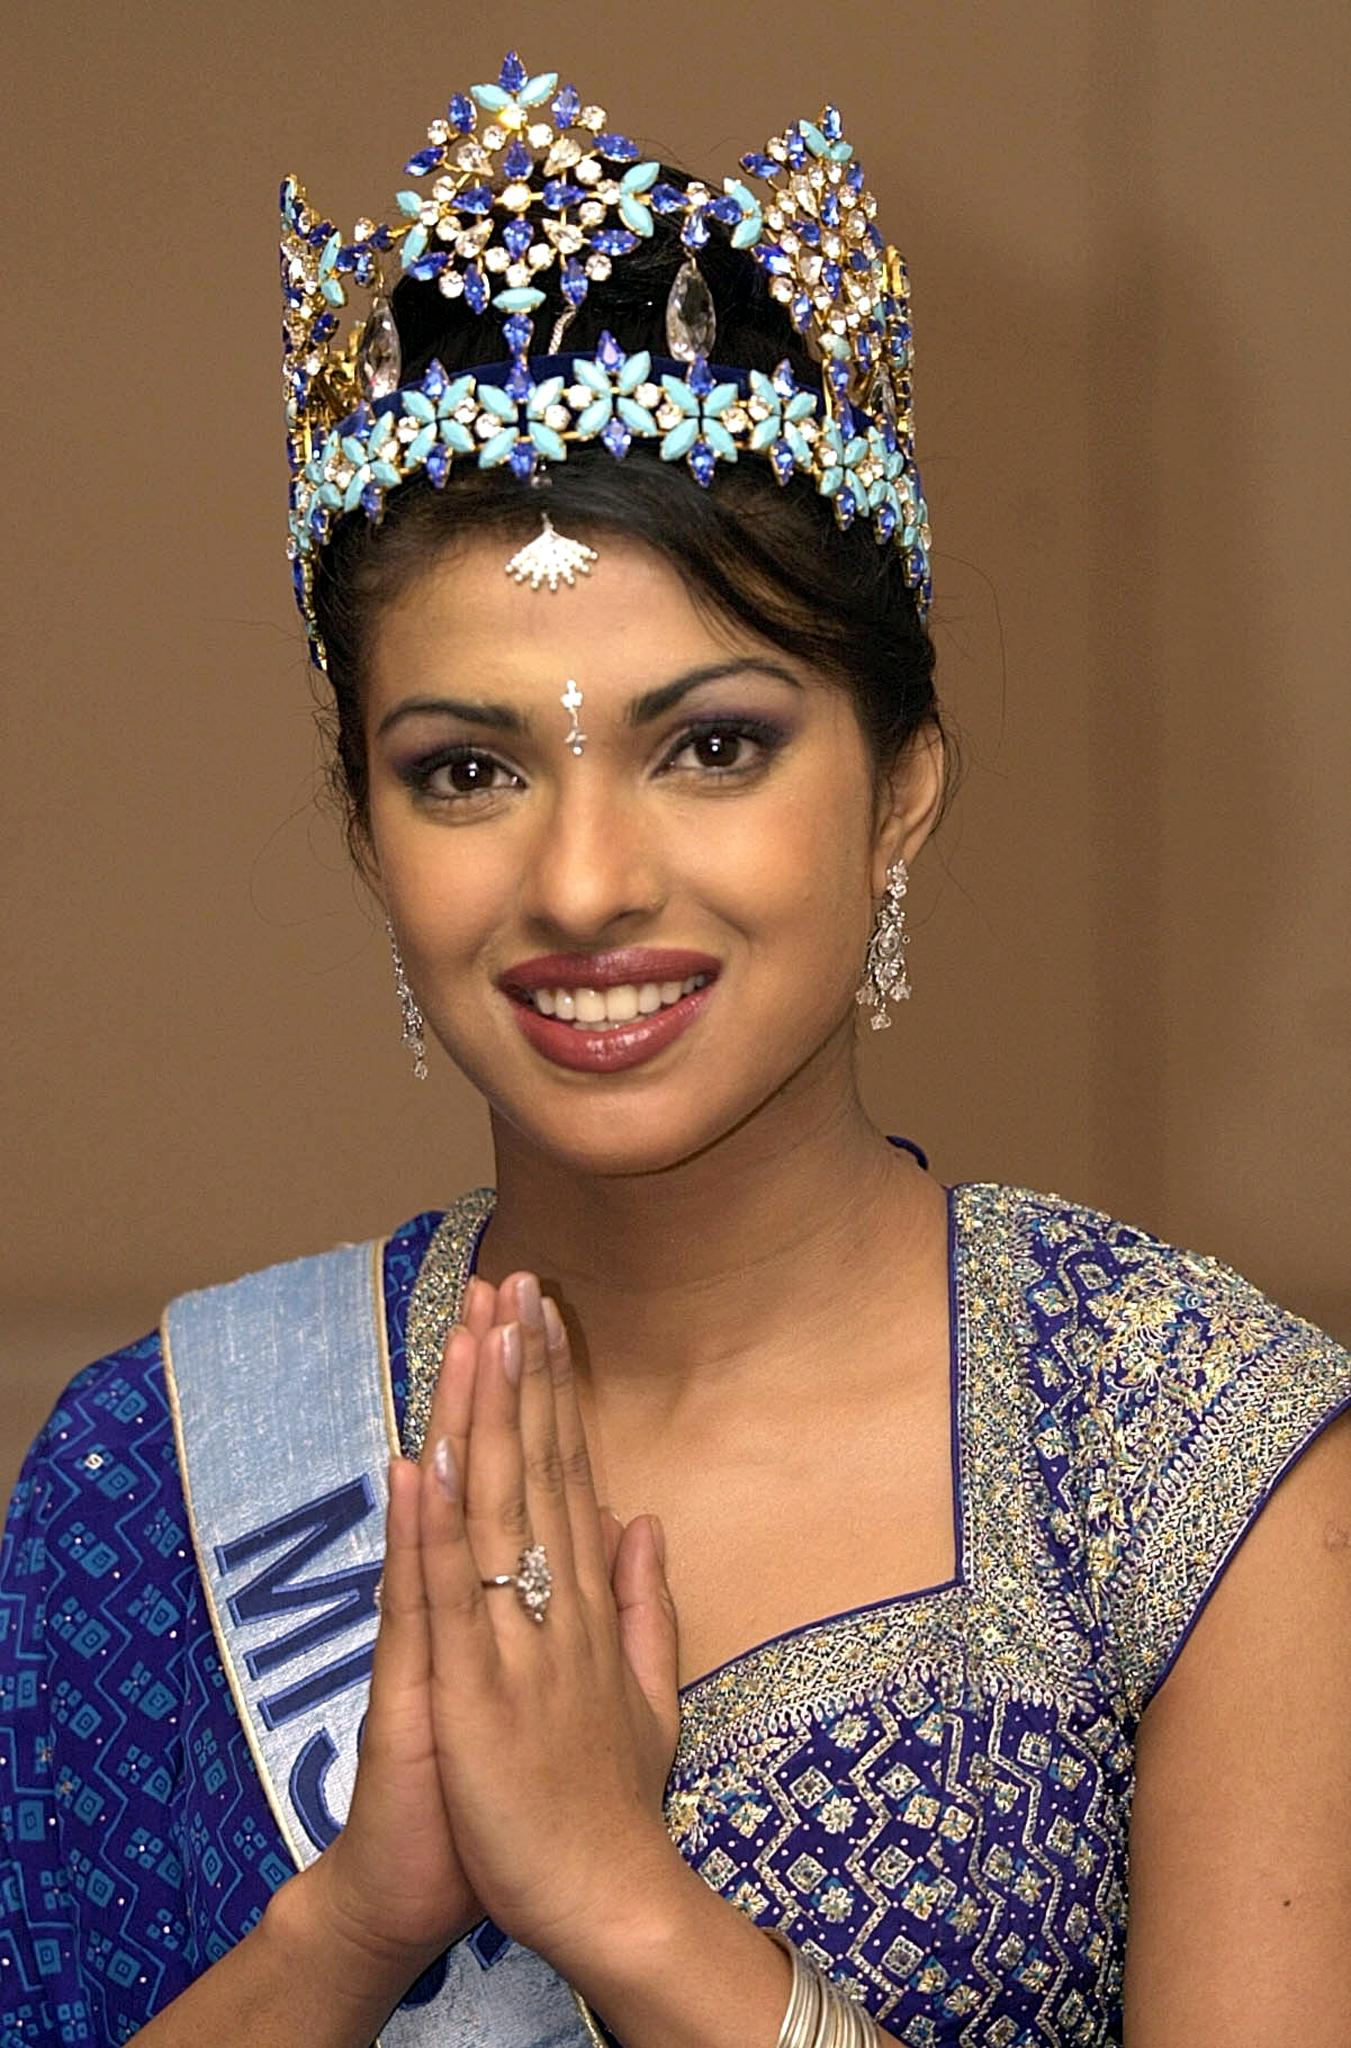 Priyanka Chopra As Miss World | Foto Bugil Bokep 2017